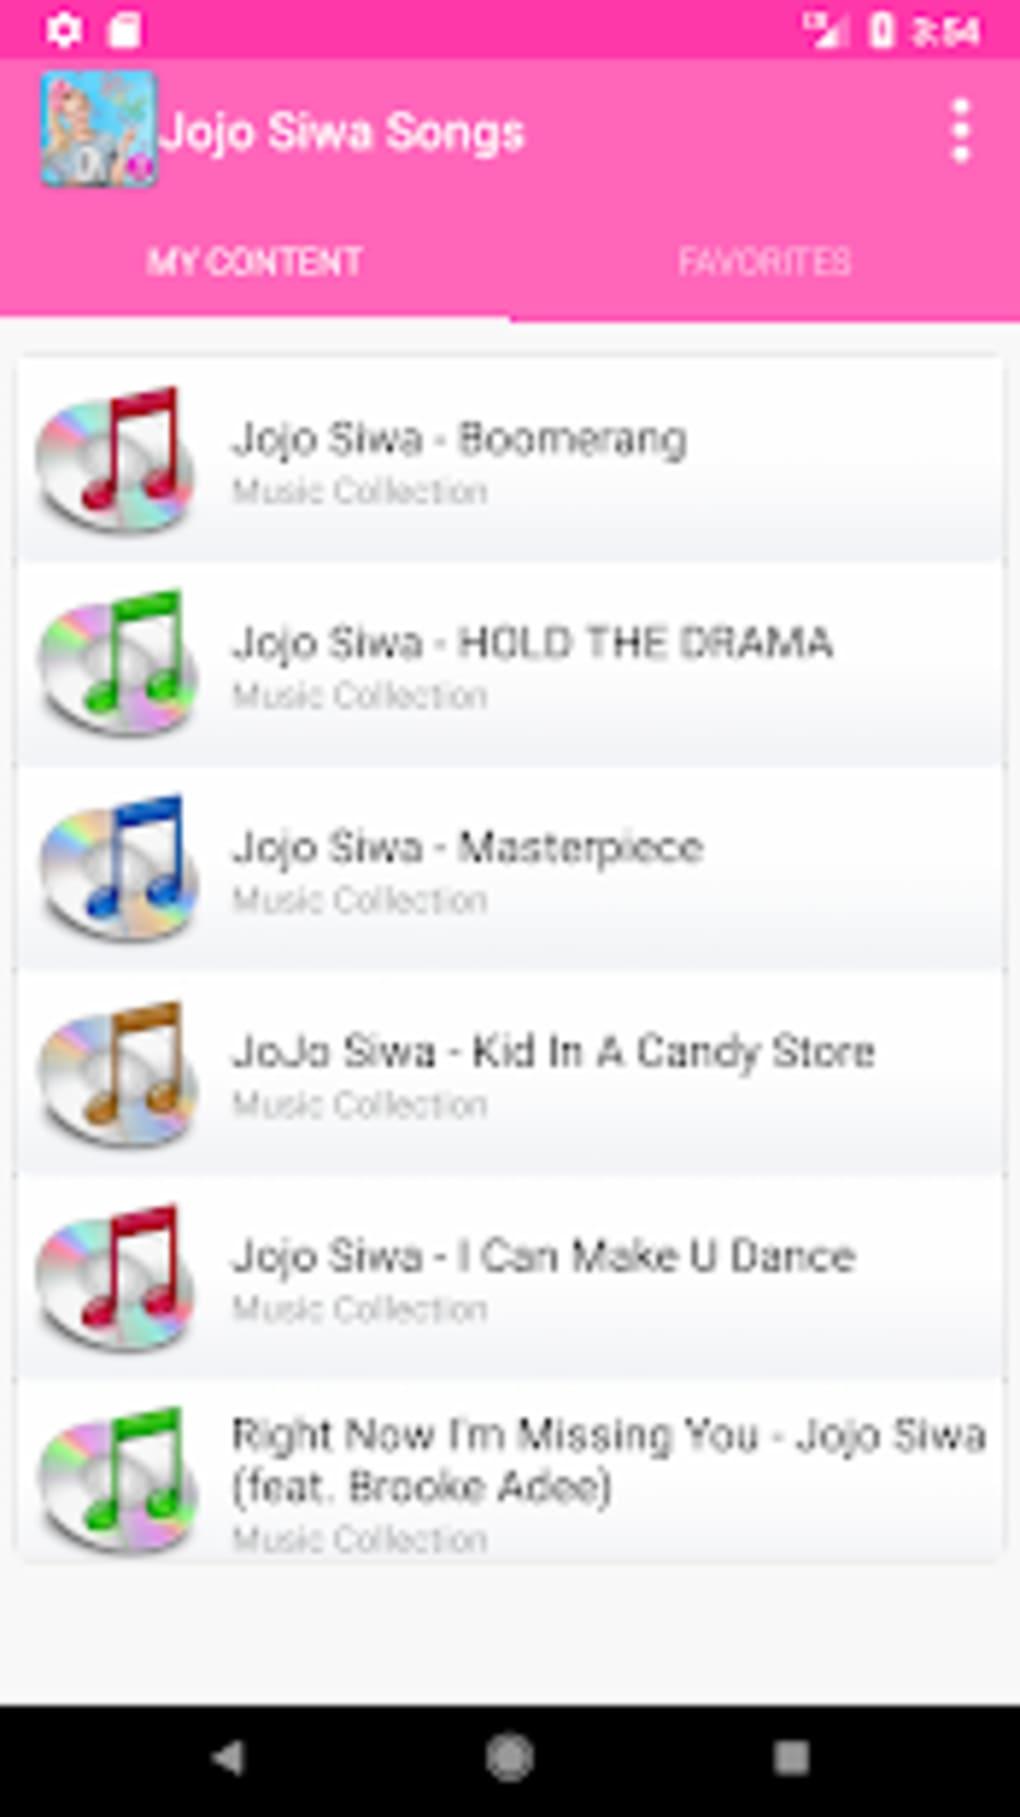 Jojo Siwa Songs New